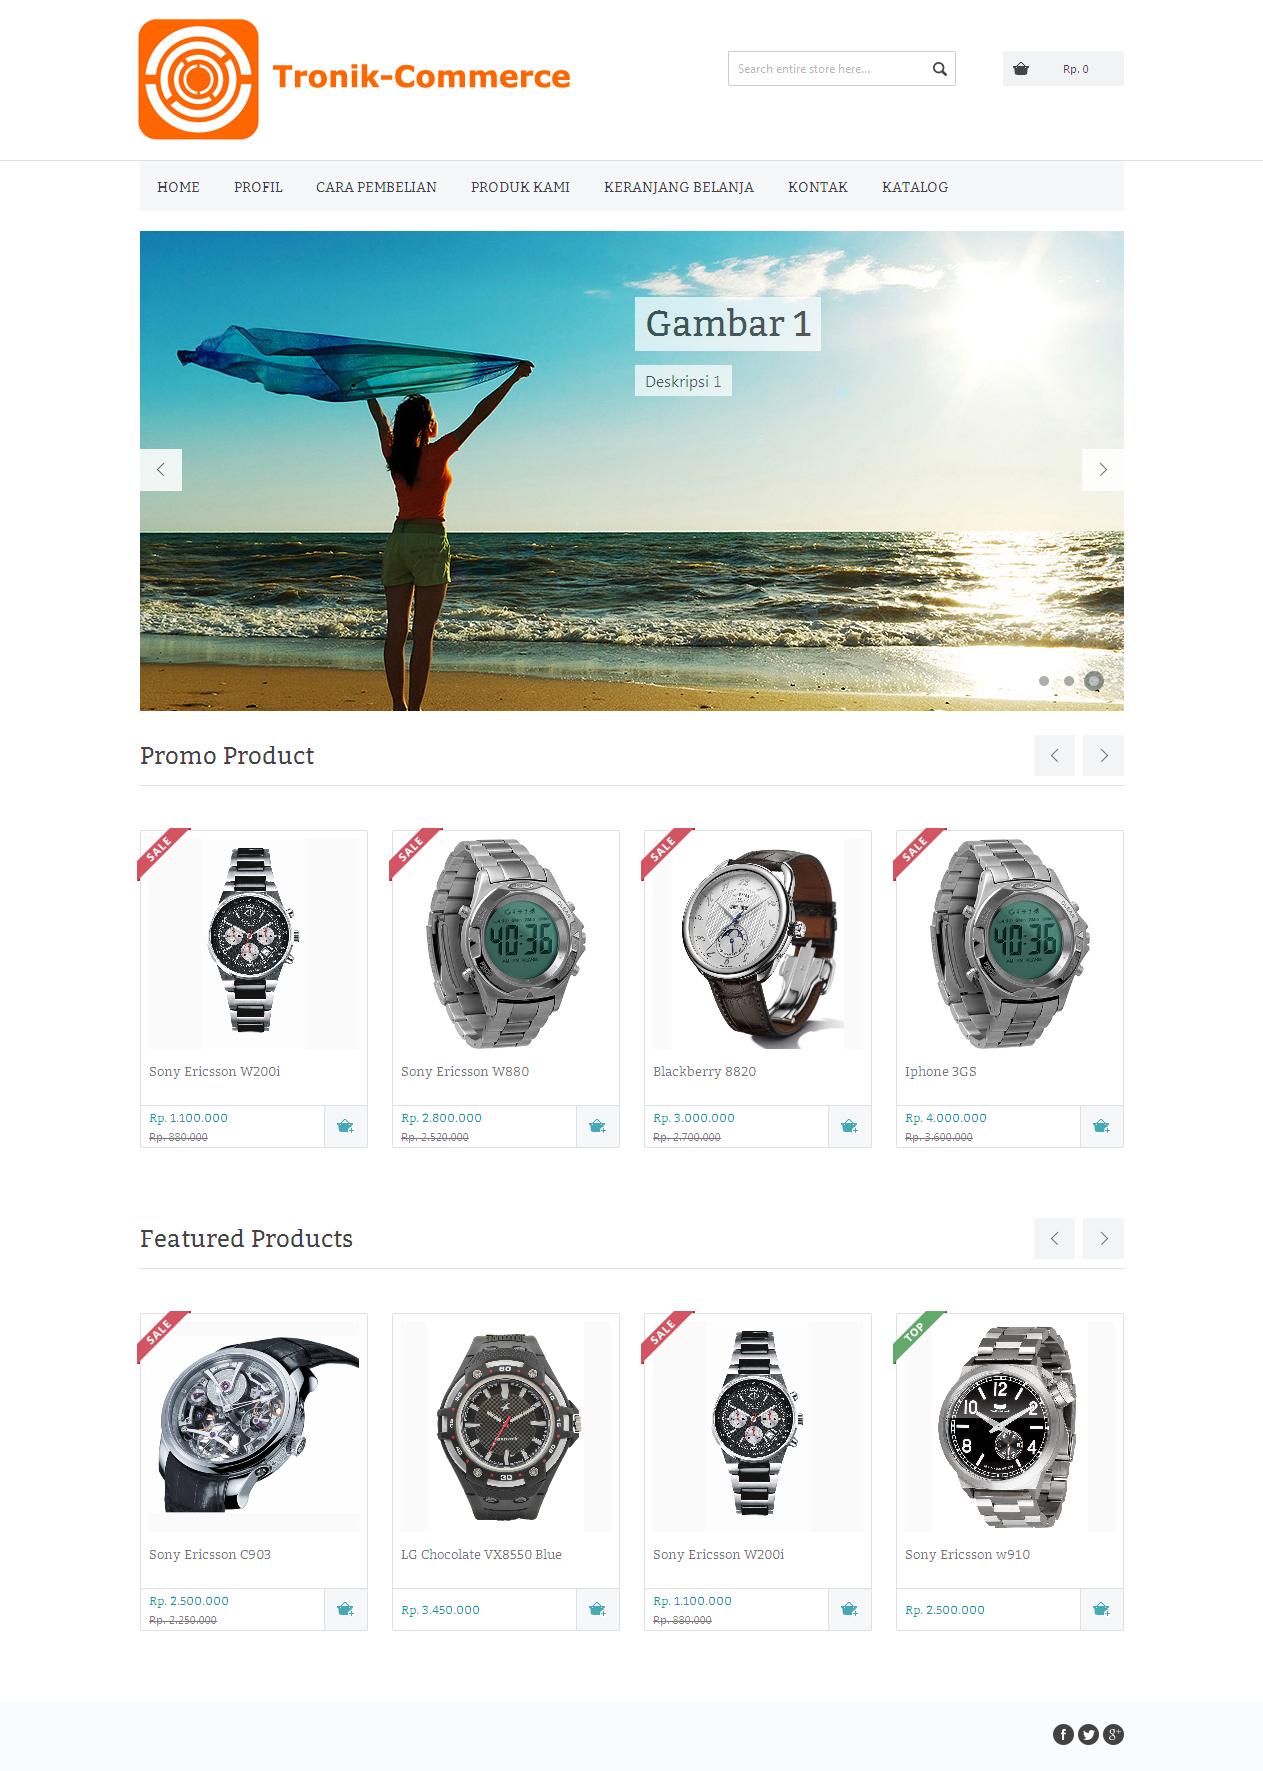 Tronik-commerce